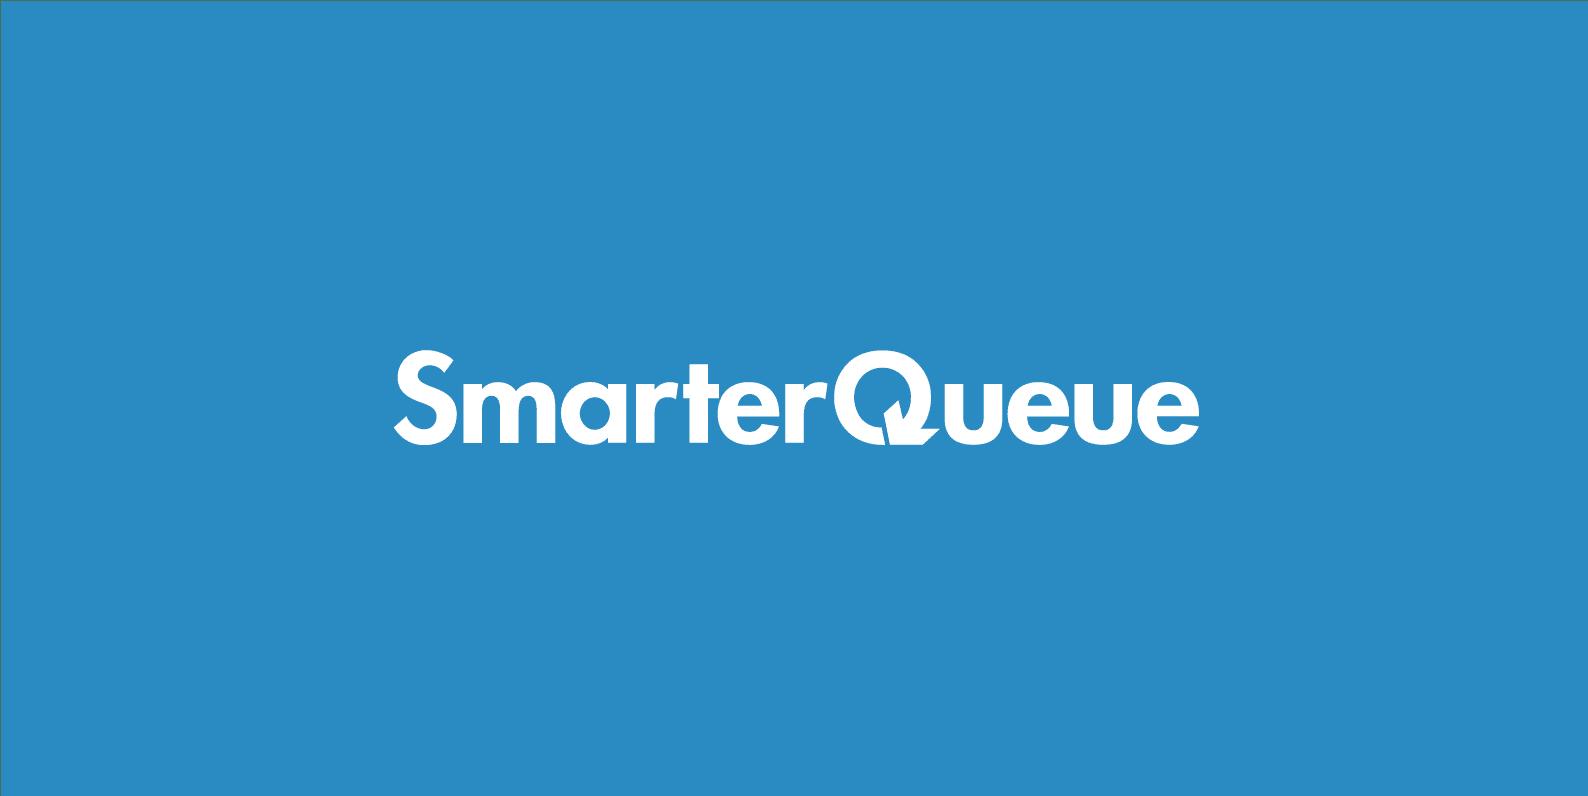 smarterqueue review edgar alternative